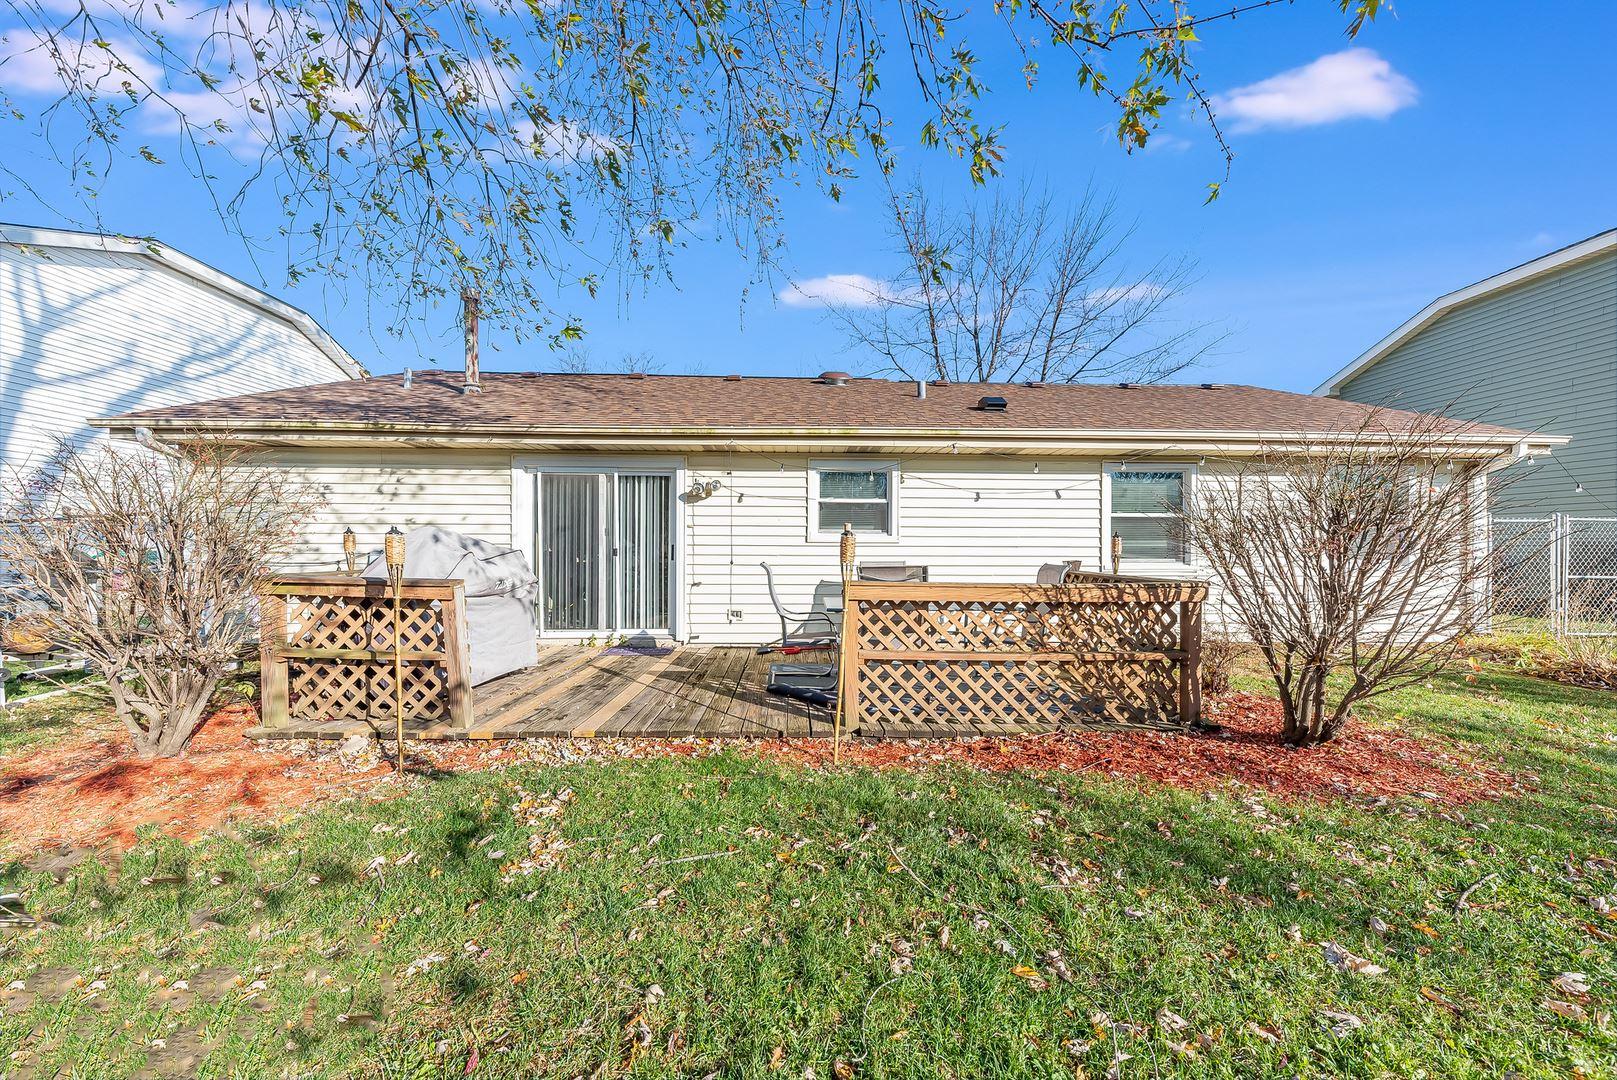 Photo of 663 Chesapeake Drive, Bolingbrook, IL 60440 (MLS # 10937303)